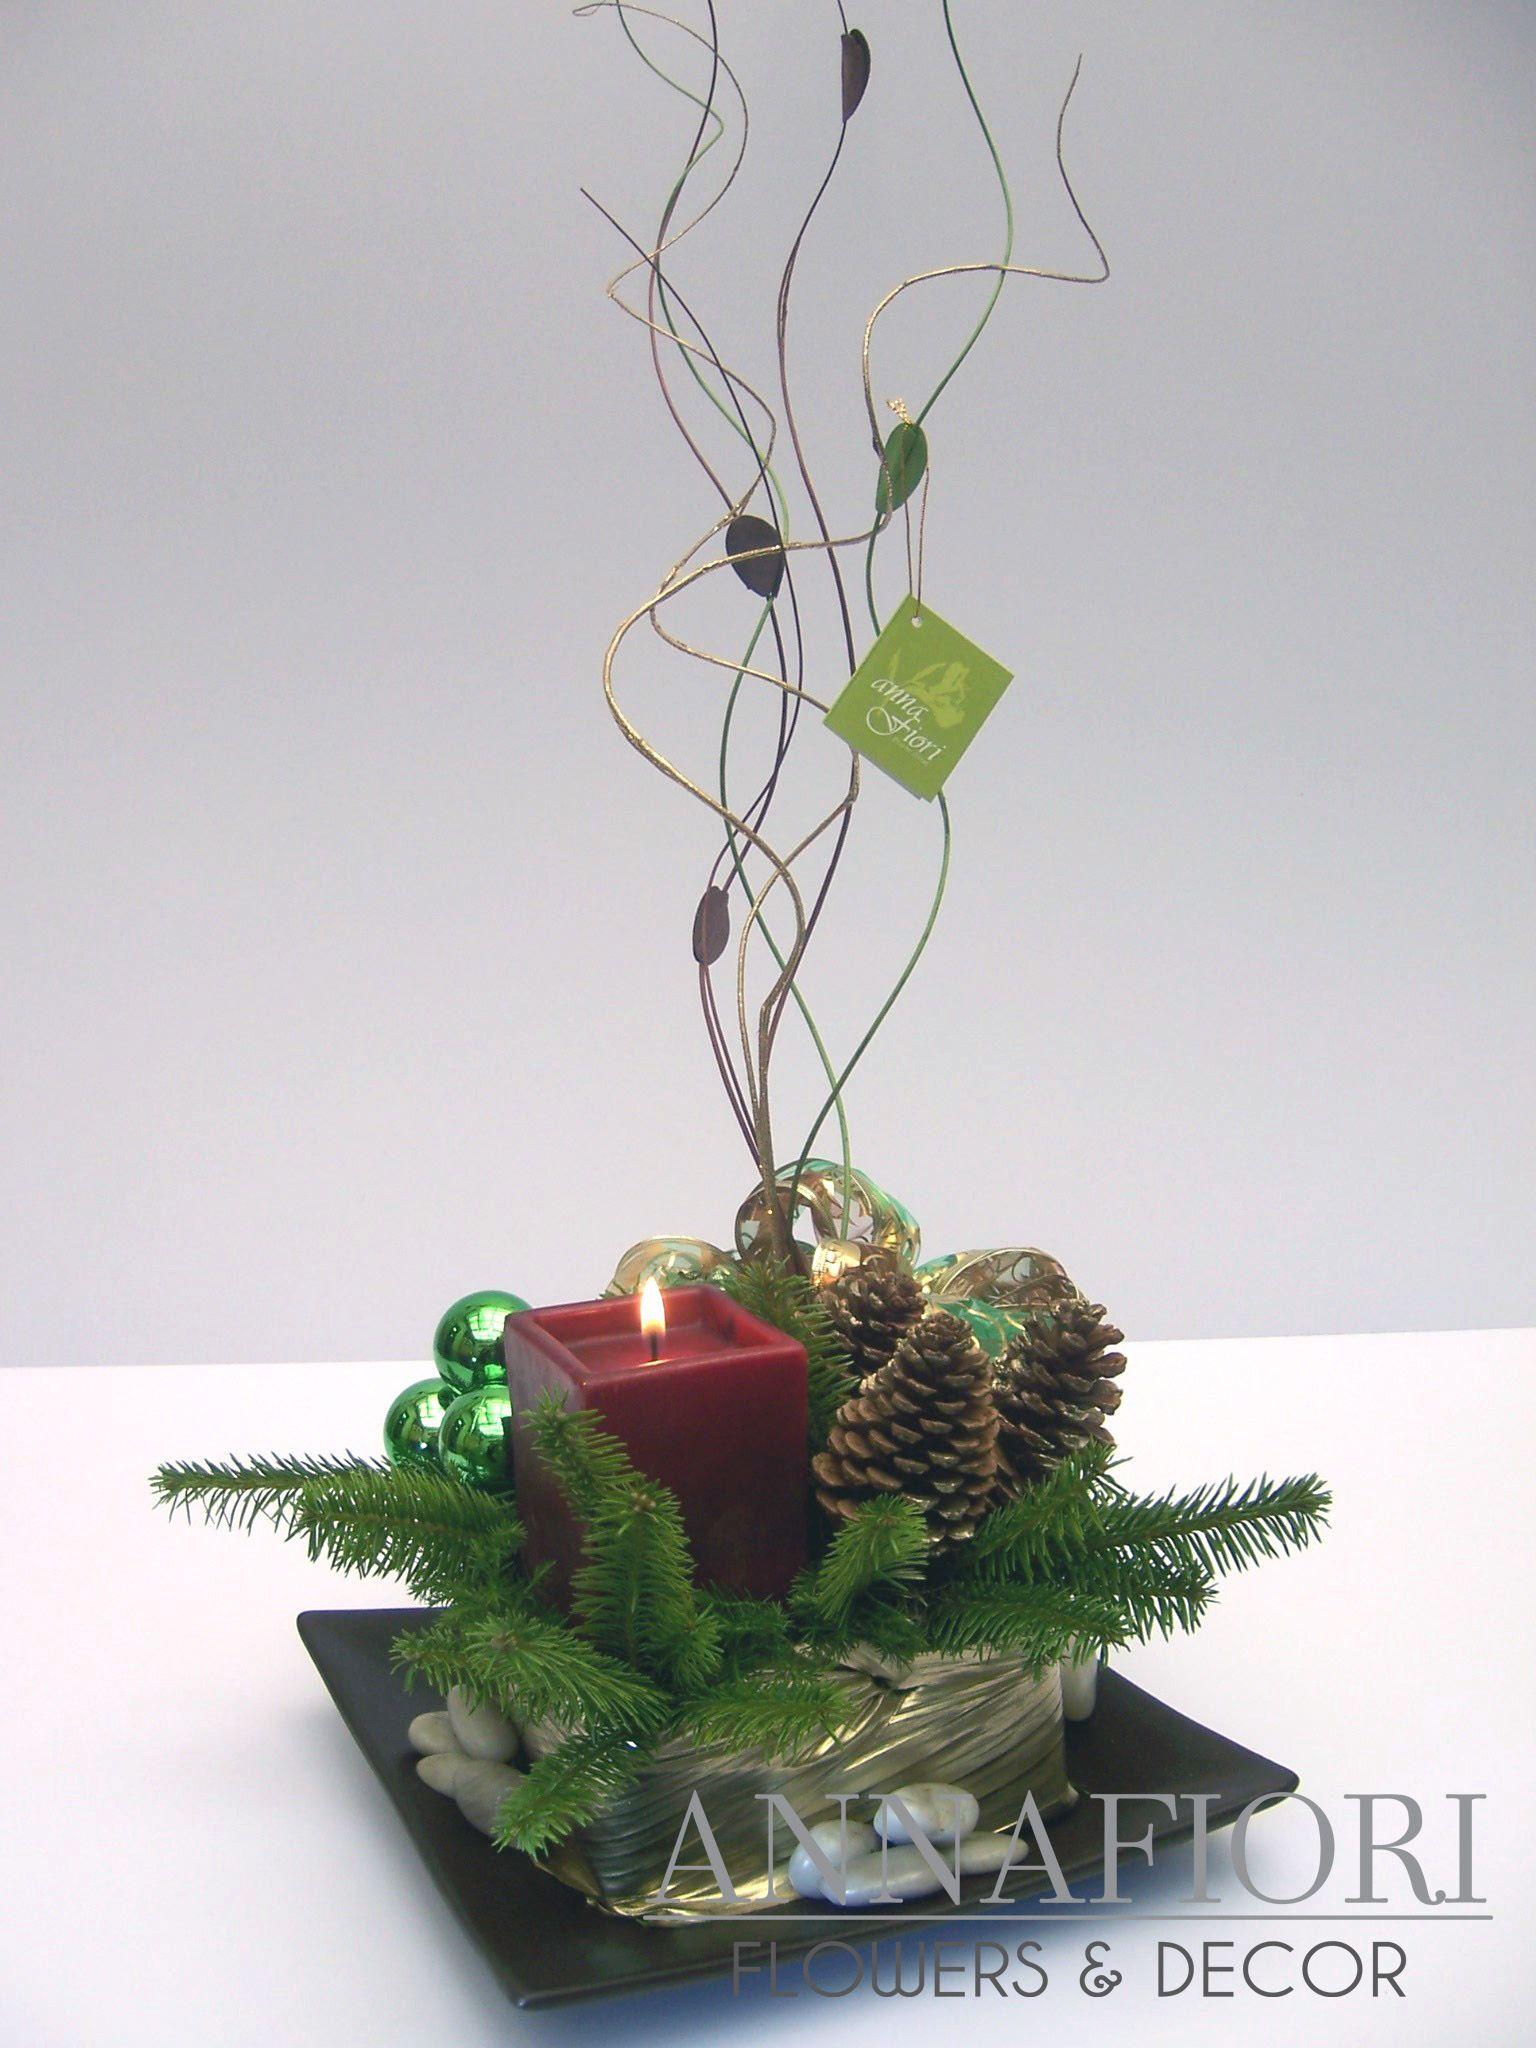 Arreglo floral centro de mesa navide o con vela roja - Arreglos con velas ...